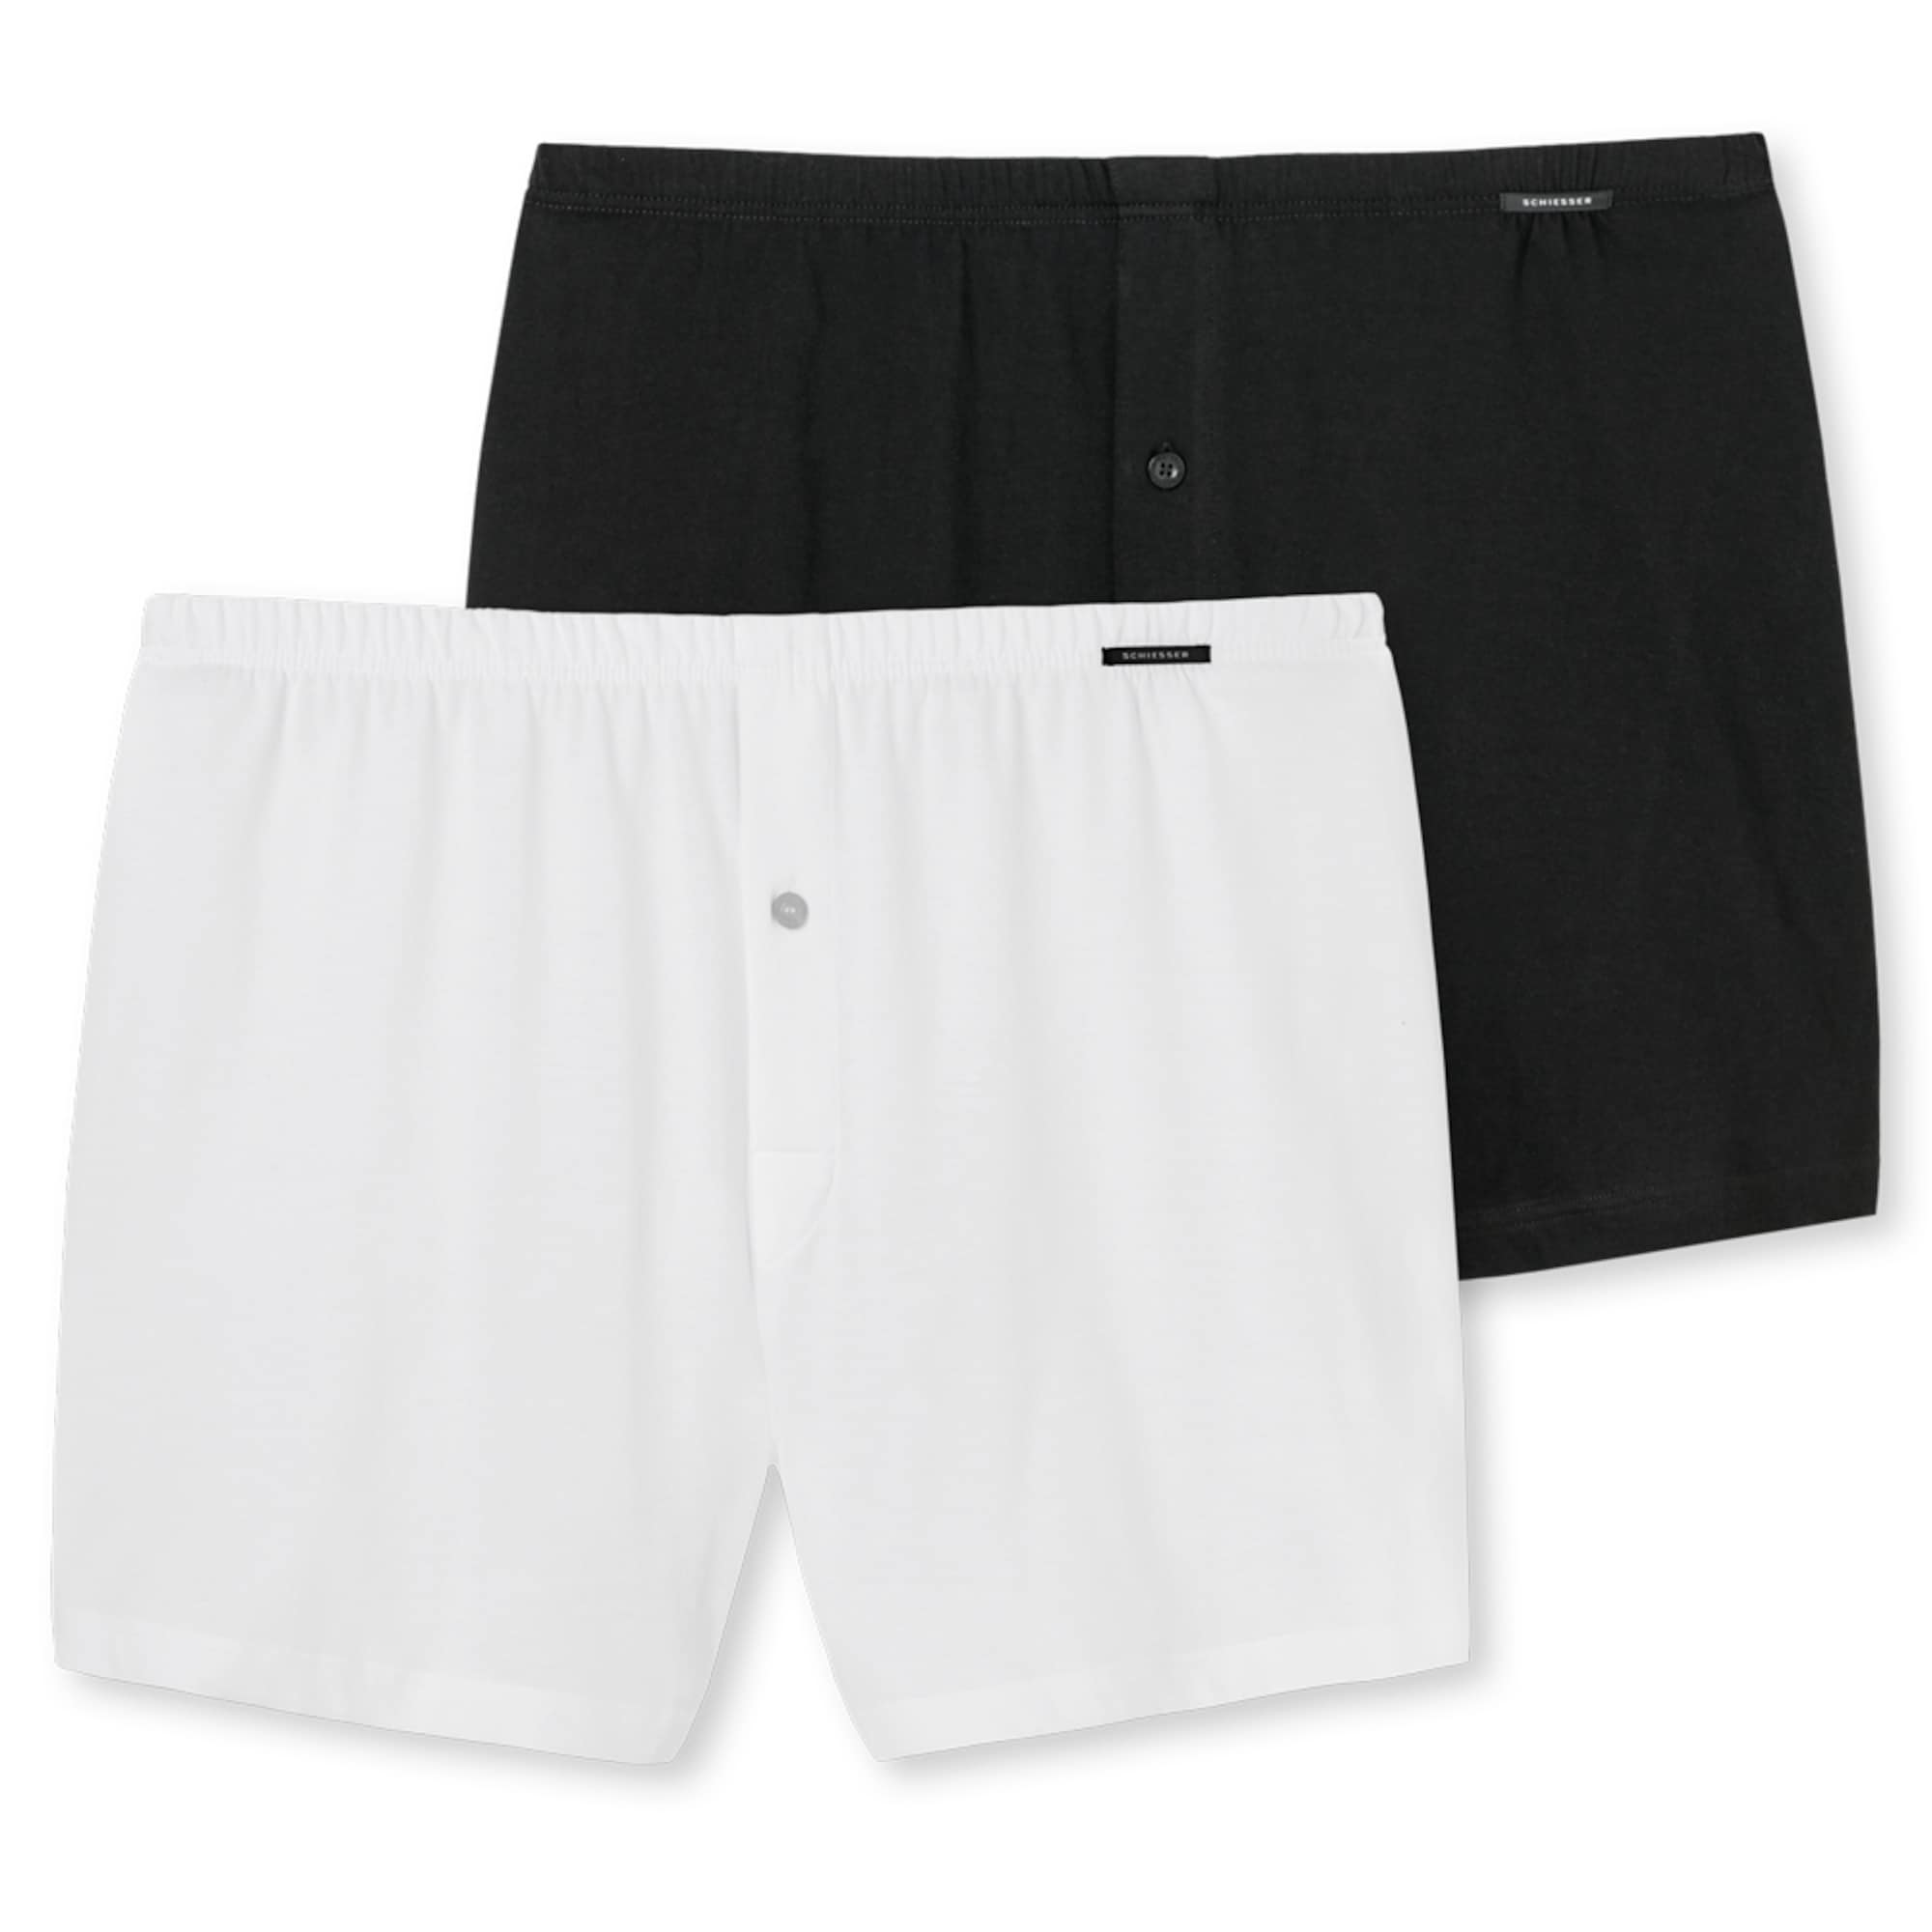 SCHIESSER Boxer trumpikės balta / juoda